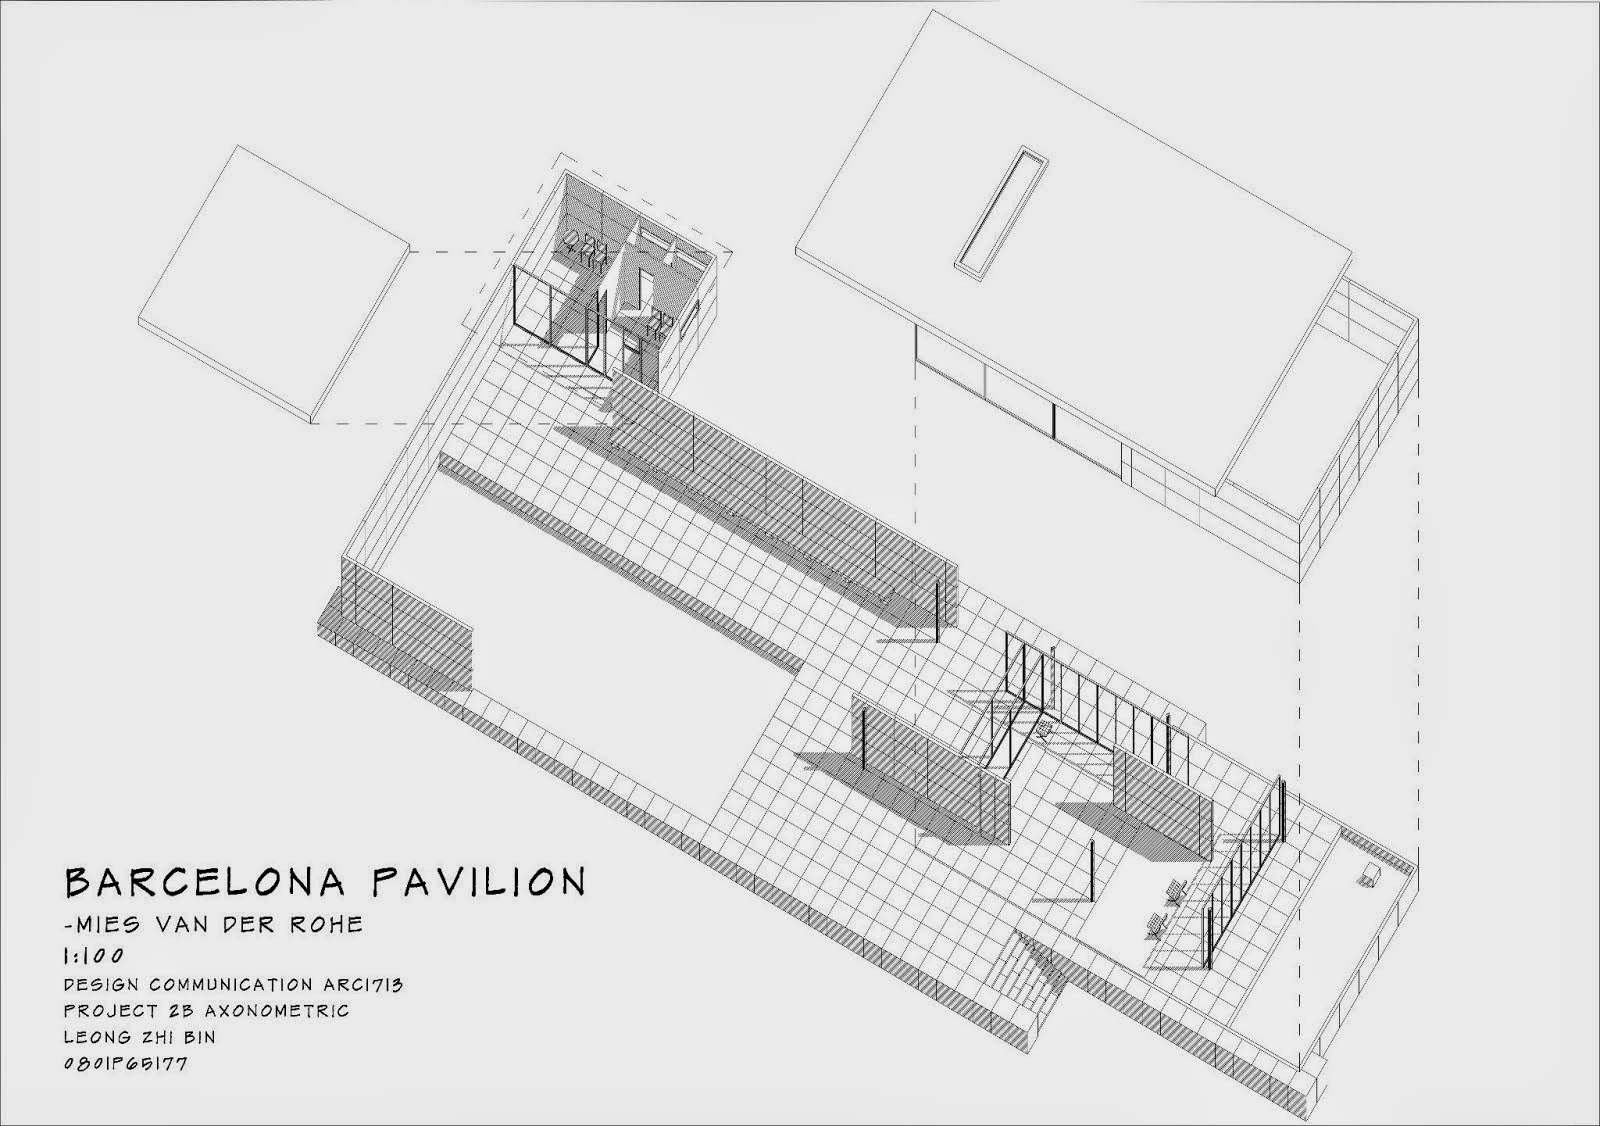 Barcelona Pavillion Axonometric Hande S N